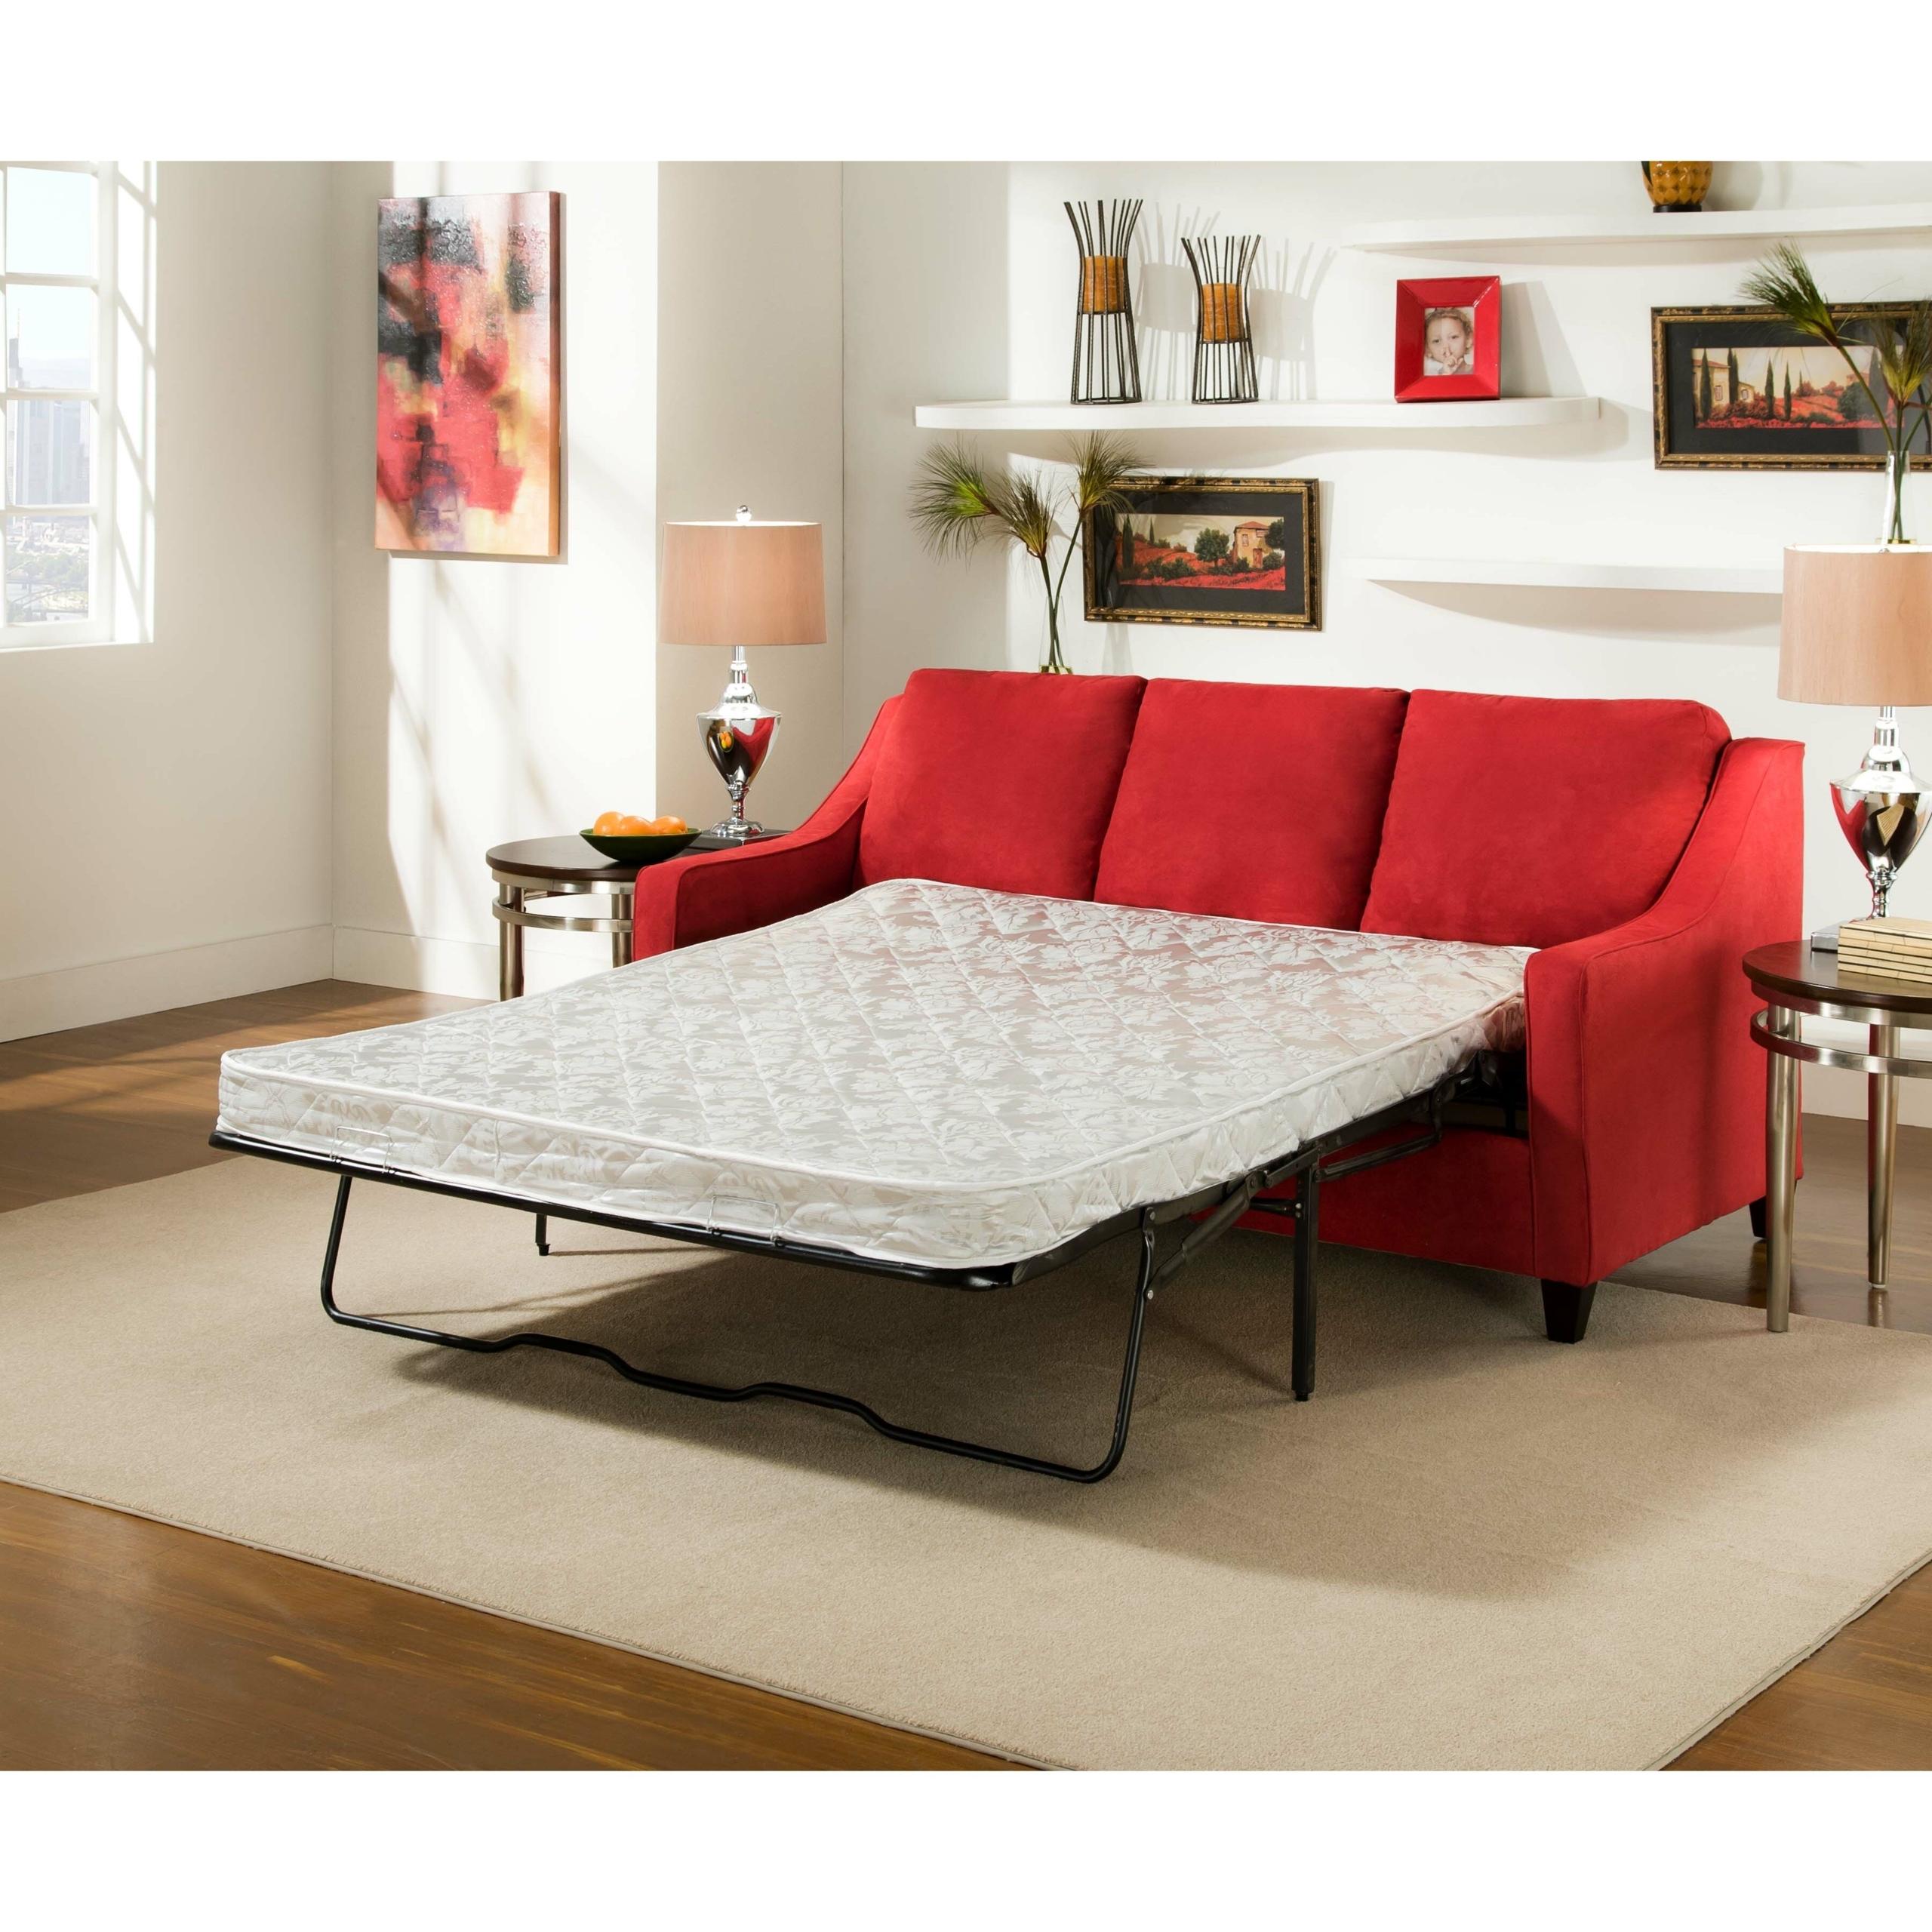 Simmons Sofa Sleeper Ideas On Foter